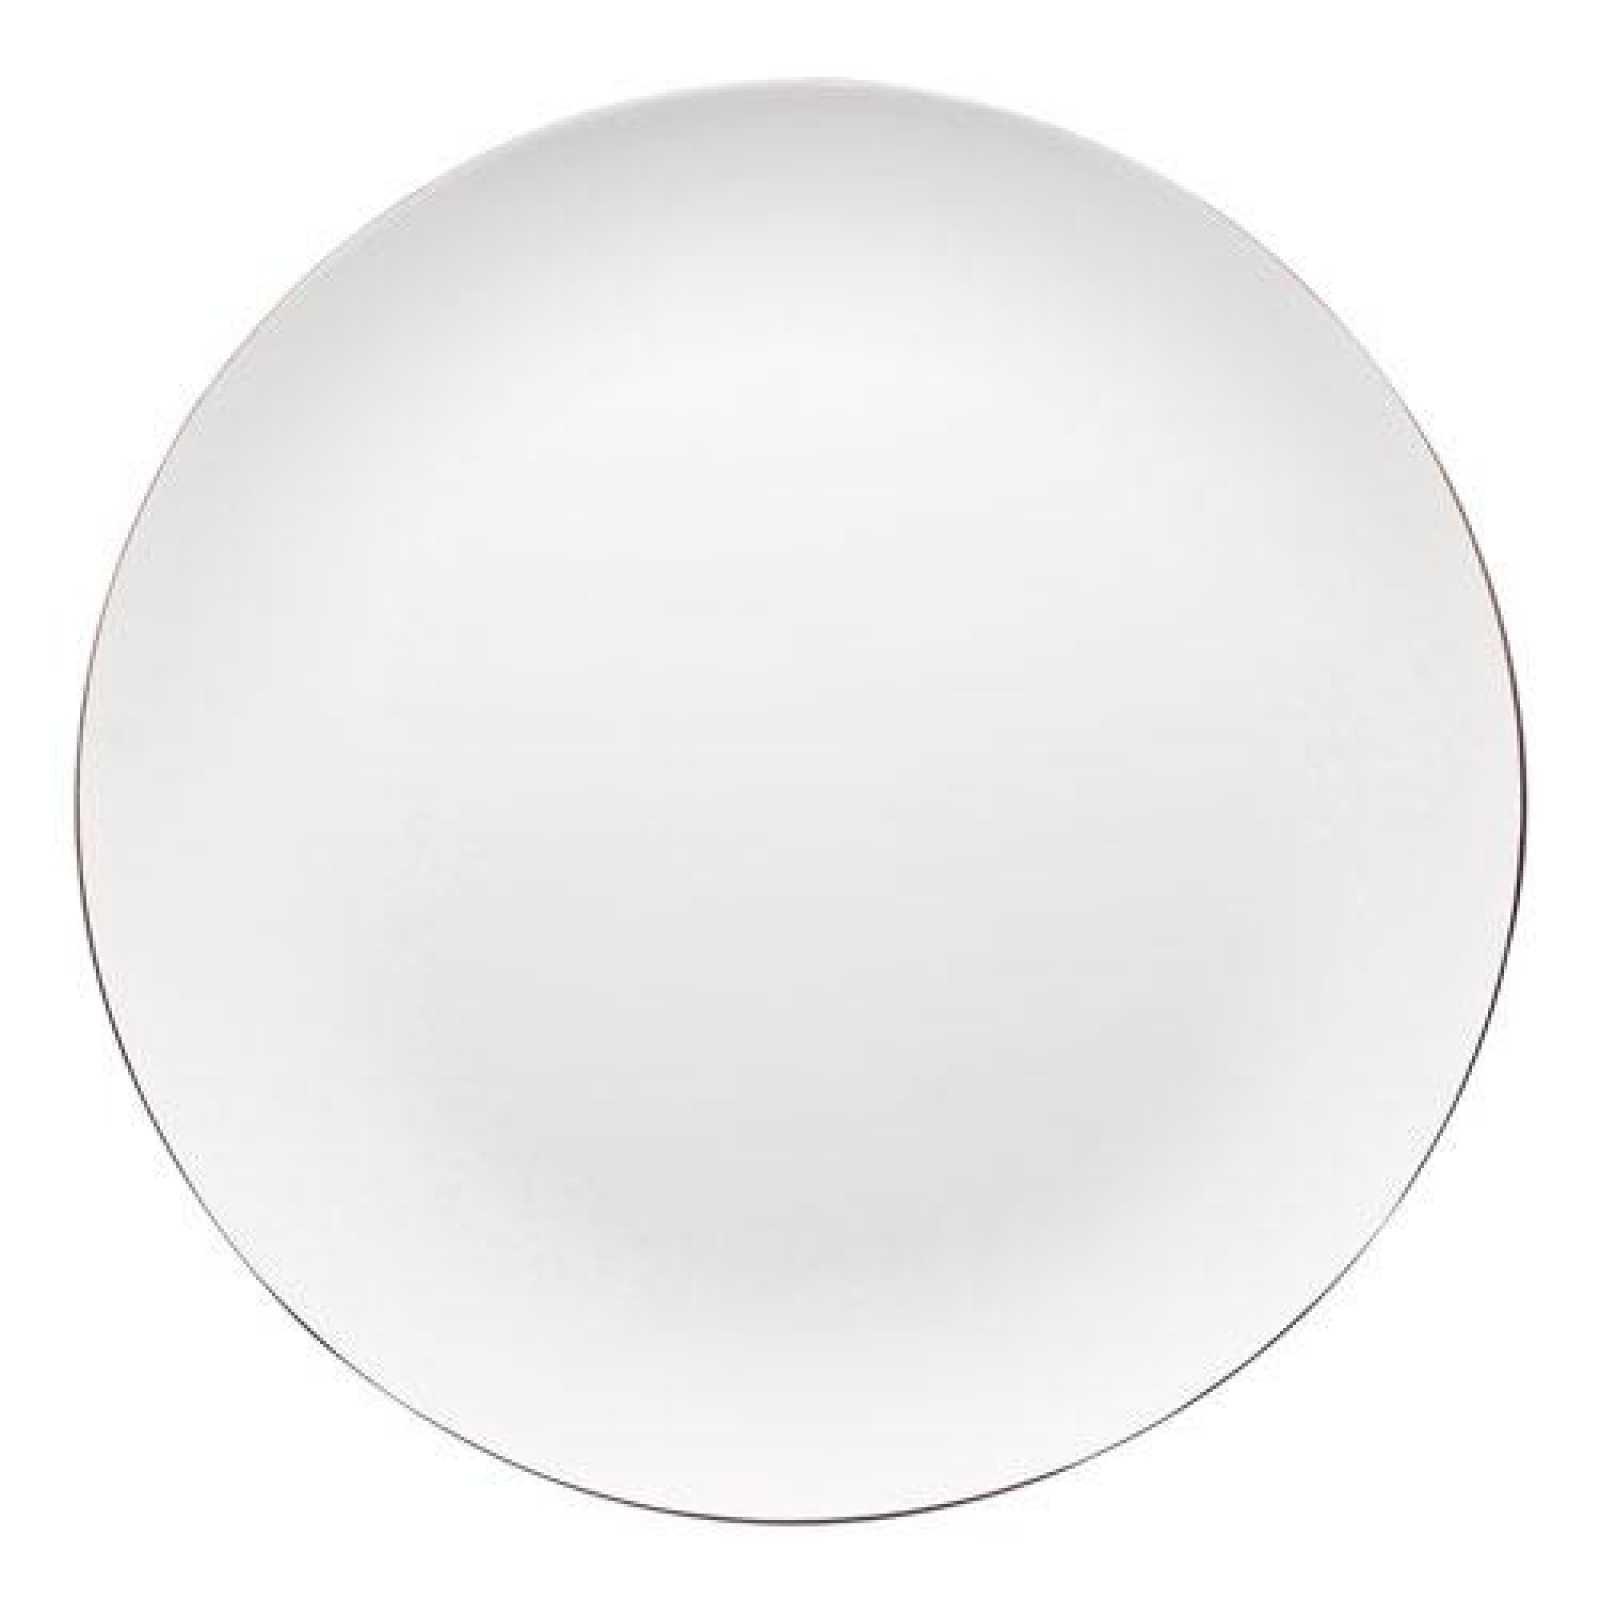 Онлайн каталог PROMENU: Блюдо фарфоровое Rosenthal SUNNY DAY, диаметр 41 см, белый Rosenthal 69763-800001-05642